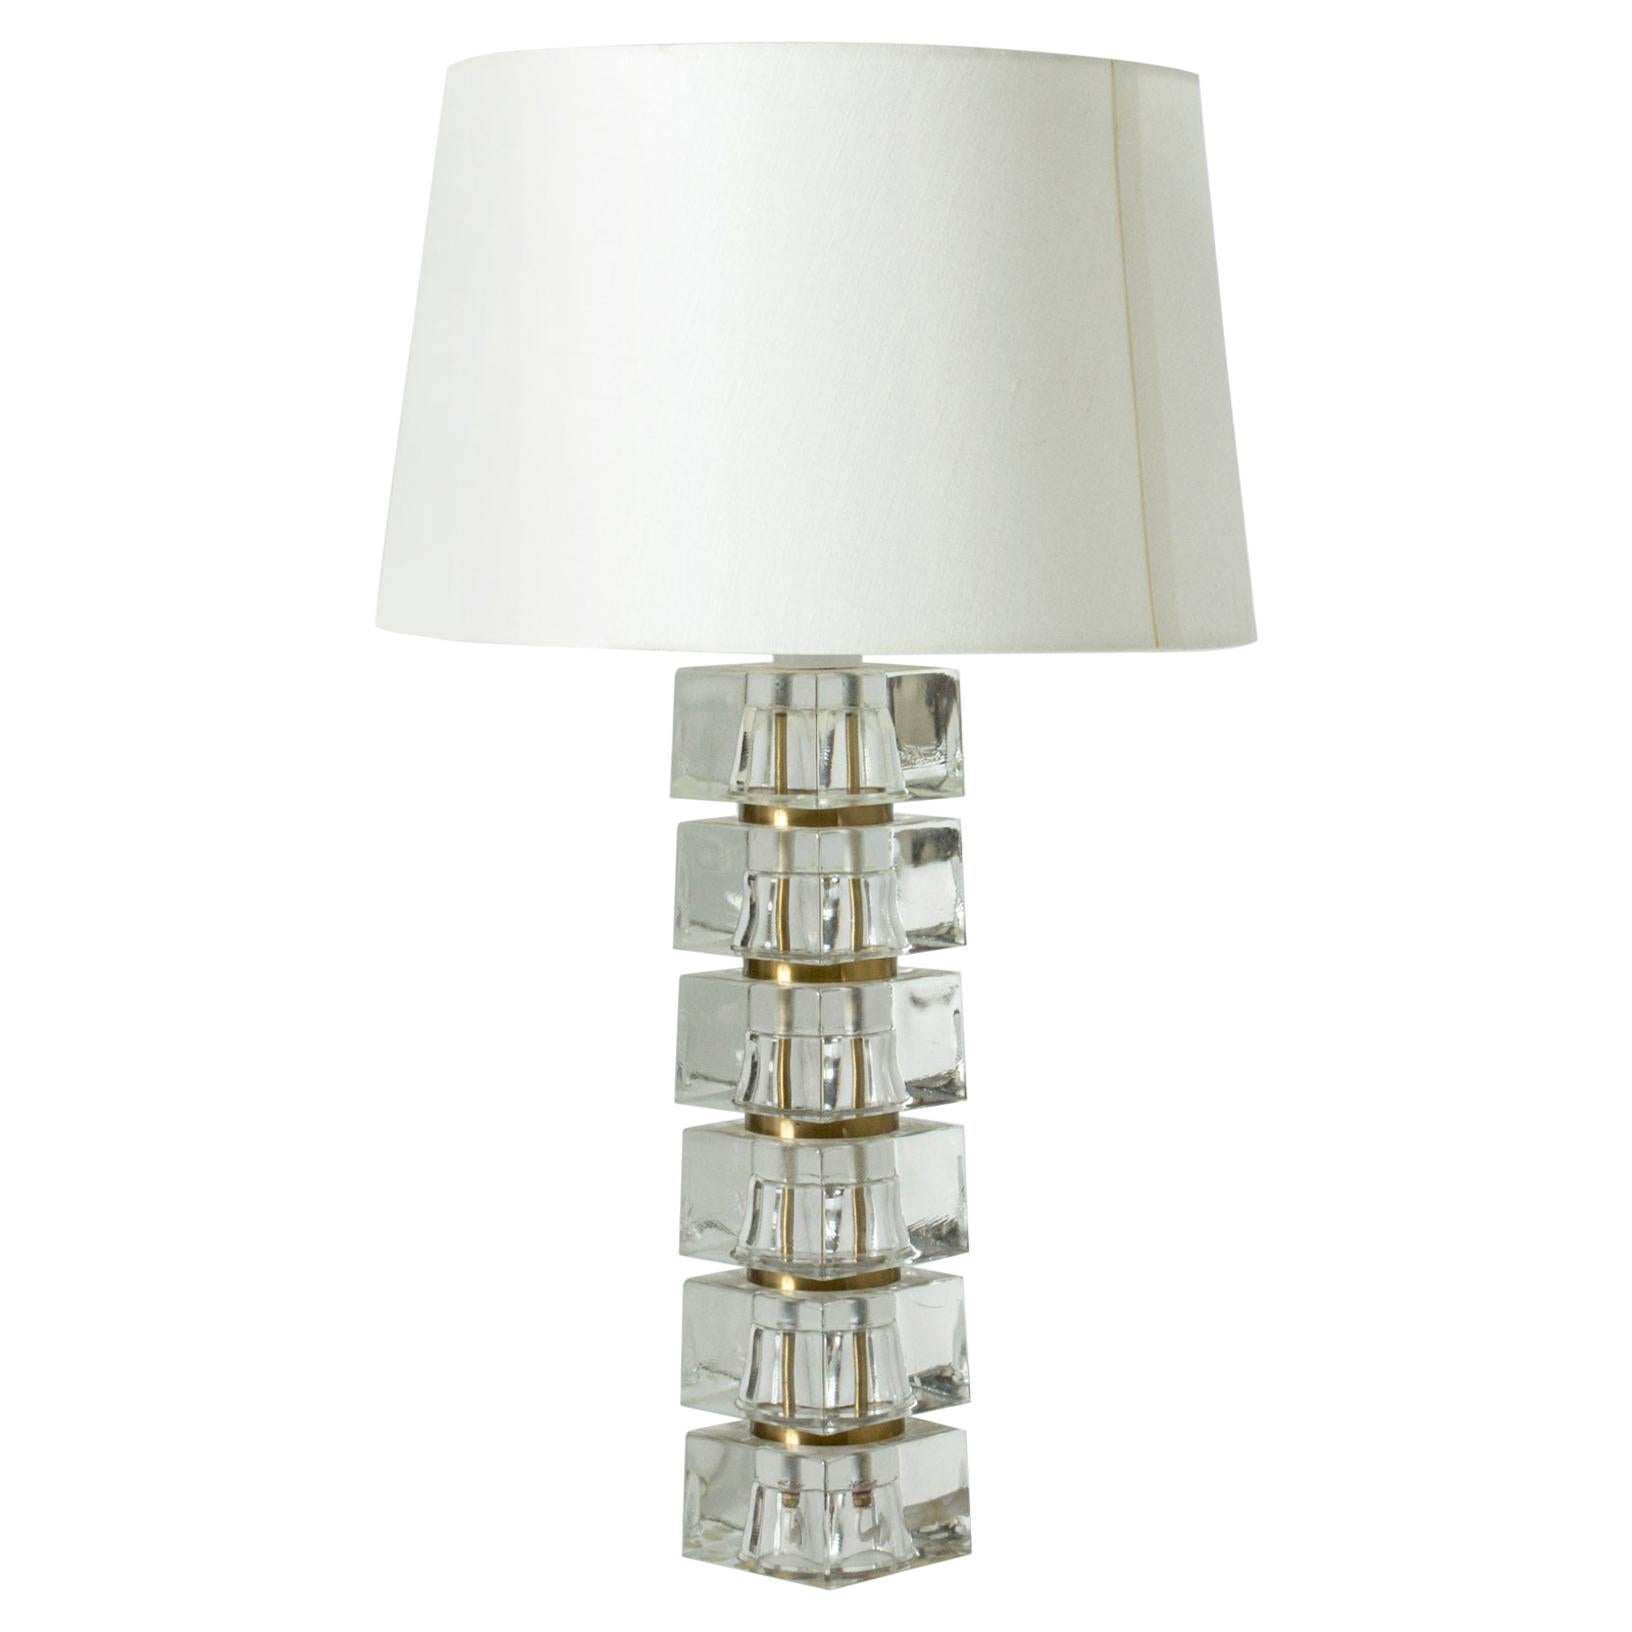 Swedish 1960s Crystal Glass Table Lamp